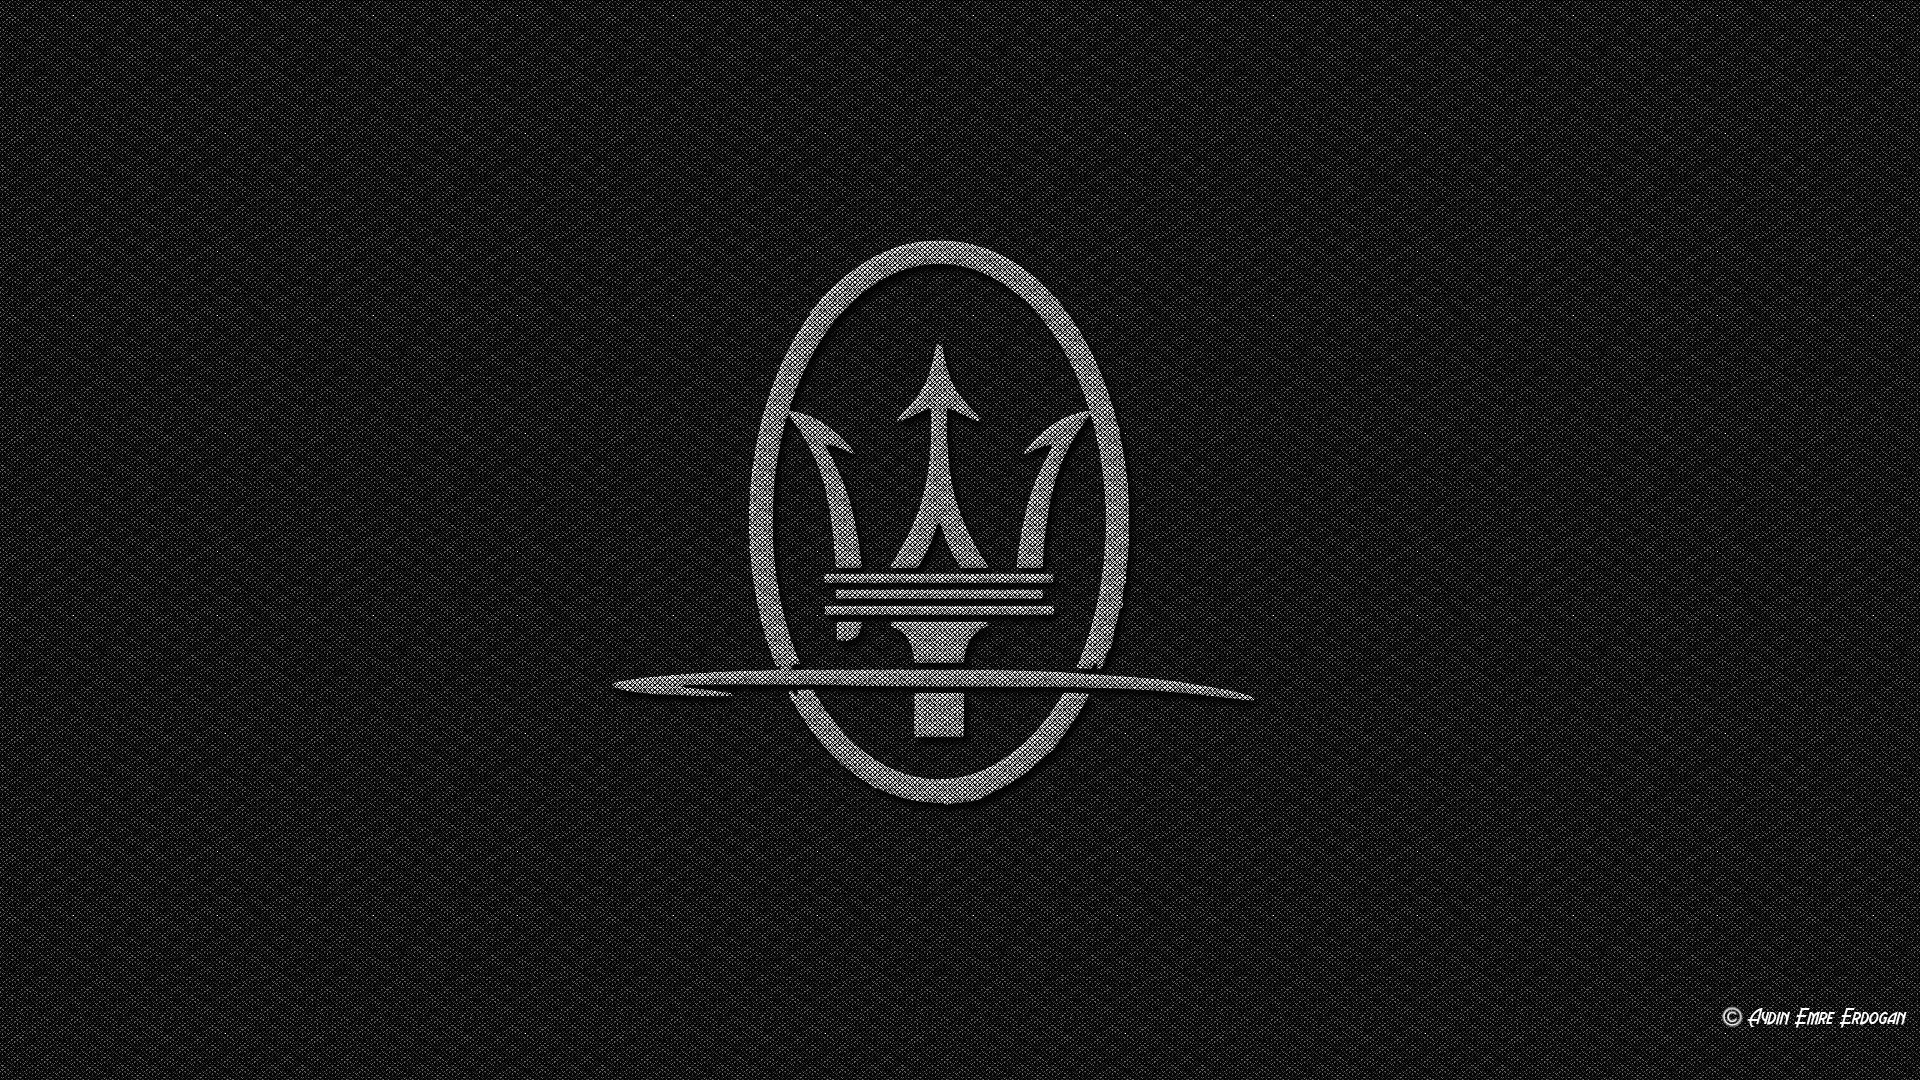 Maserati, Logo, Carbon Fiber, Black Background. Wallpaper Details